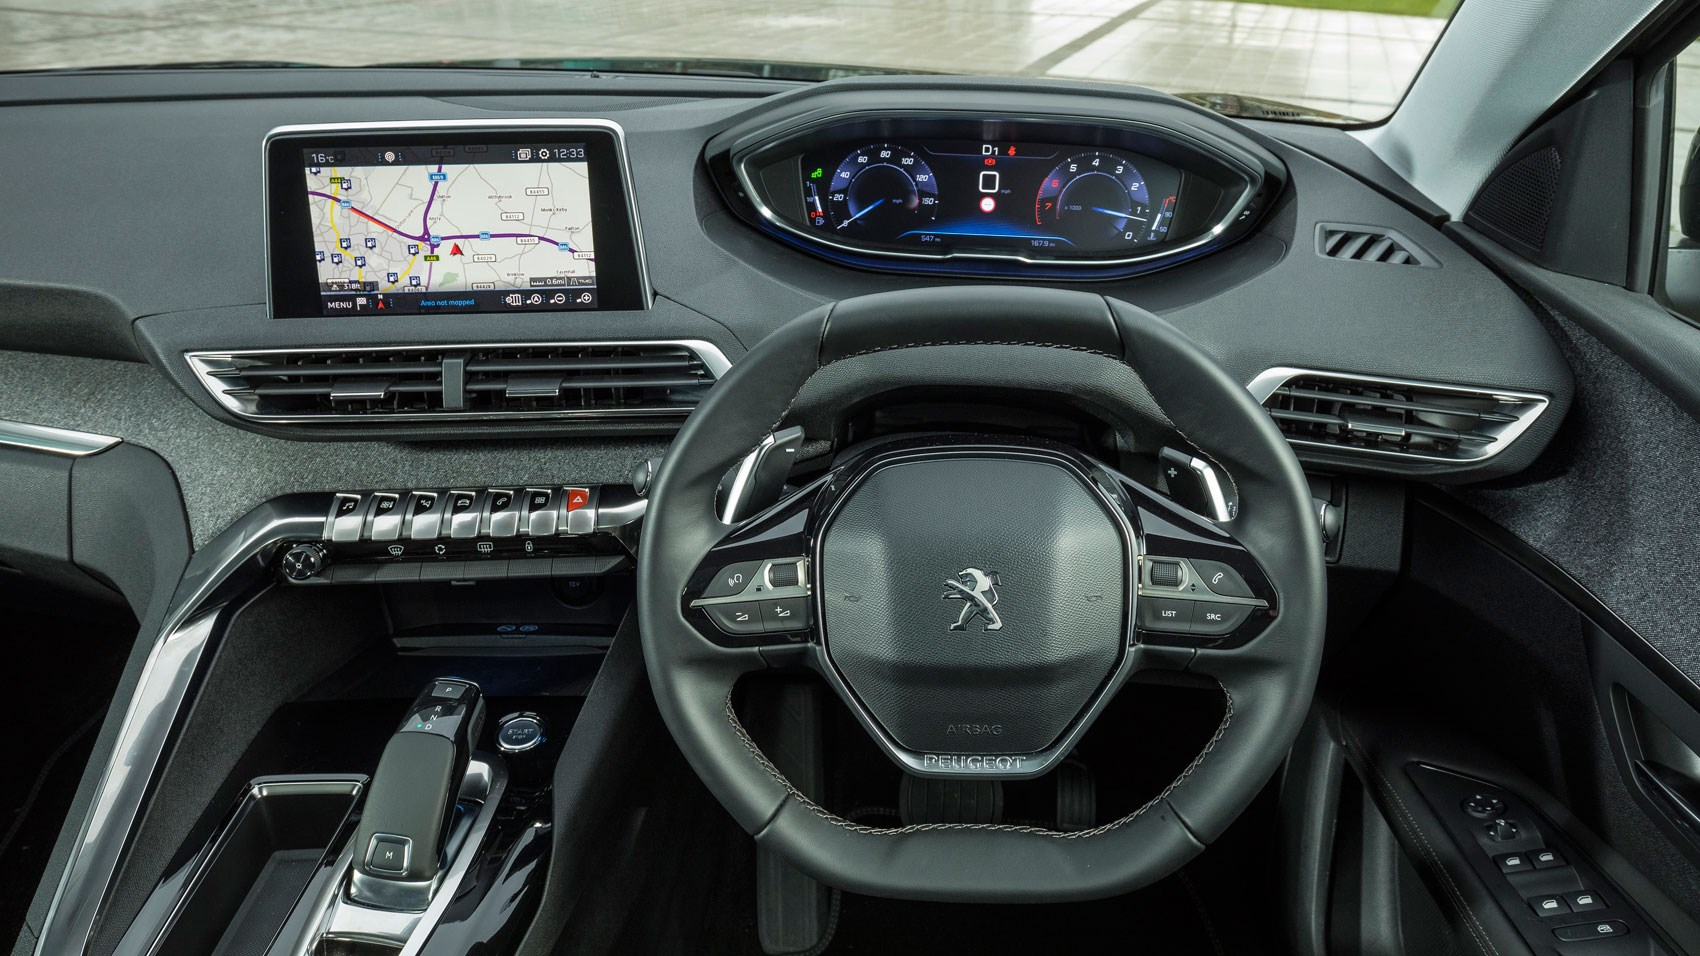 Peugeot 3008 1 6 THP 165 EAT6 Allure (2017) review | CAR Magazine